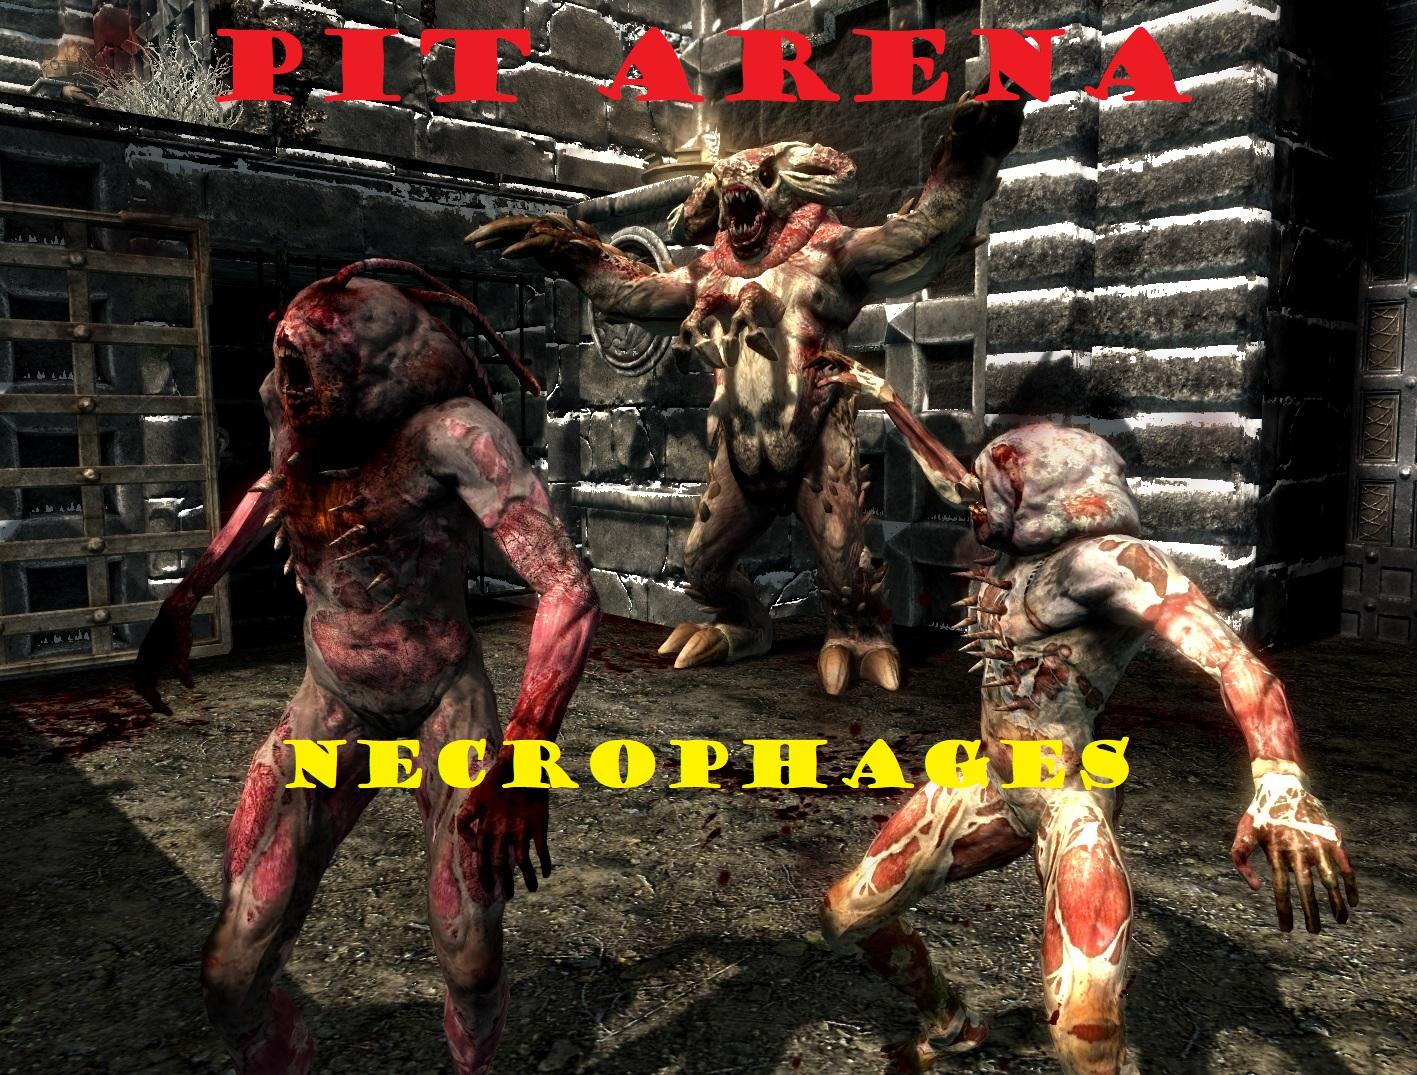 Pit arena necro 2